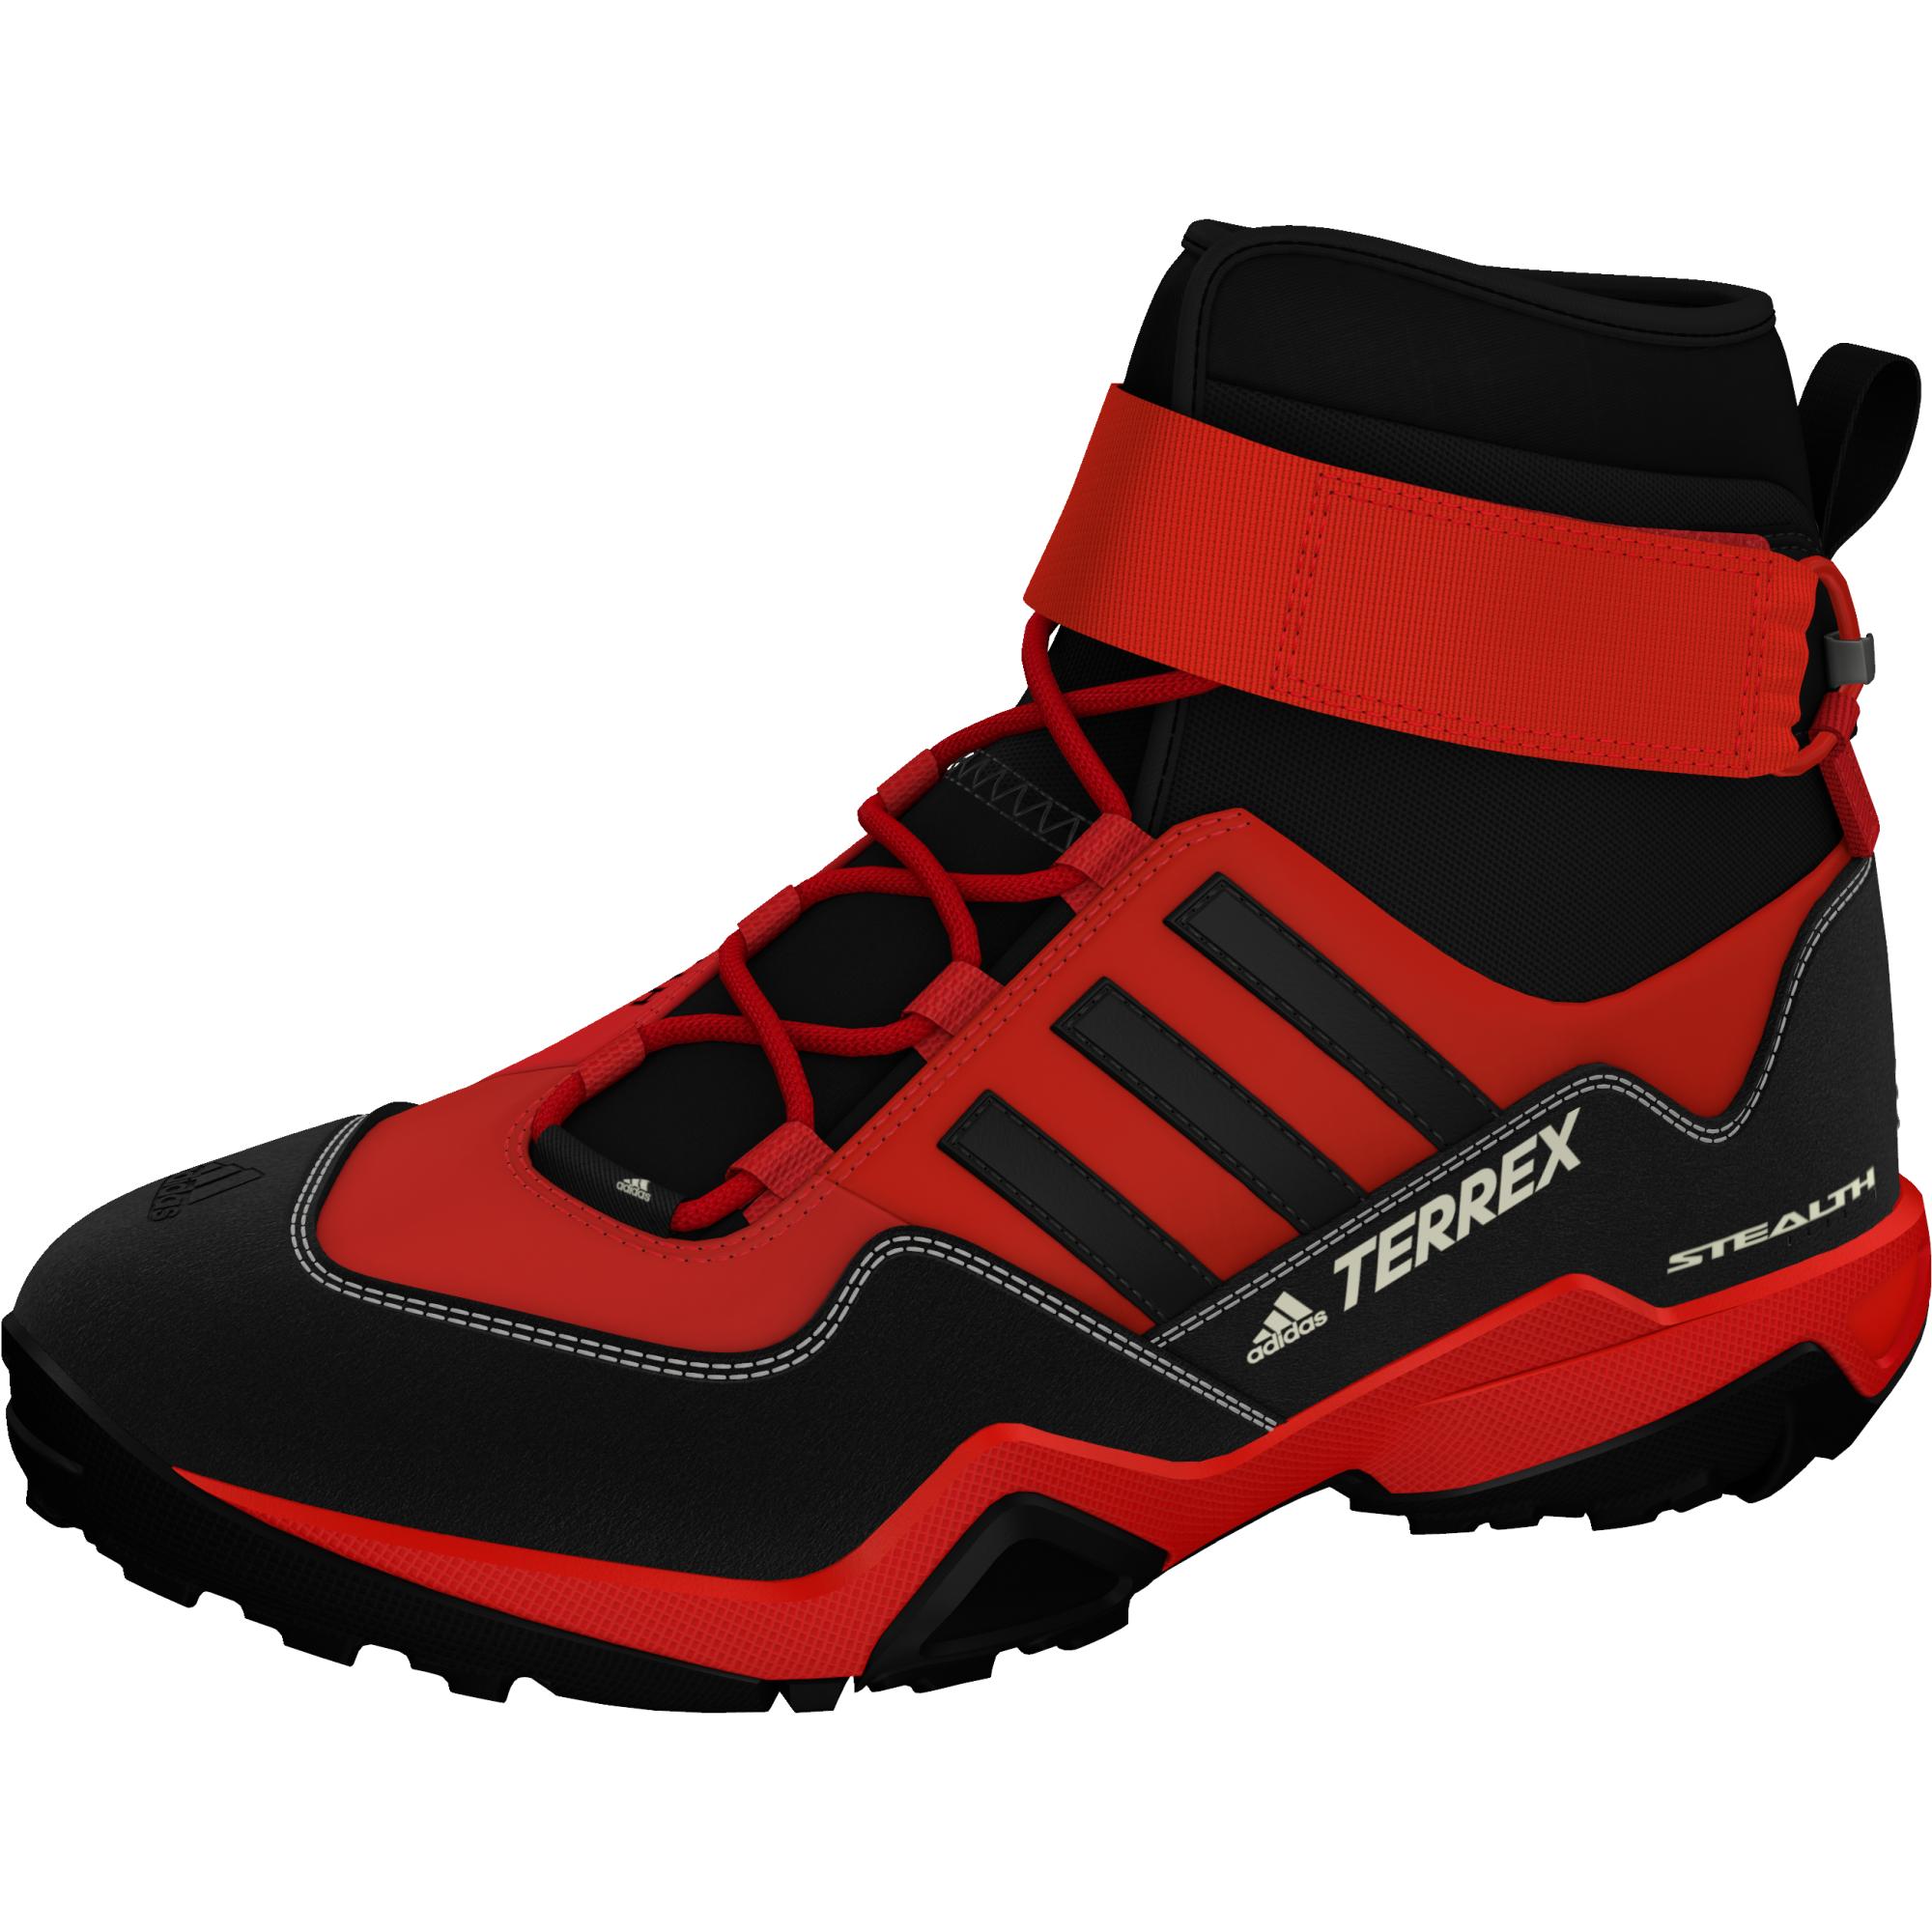 Canyoningschuh Adidas Hydro Lace 20192020